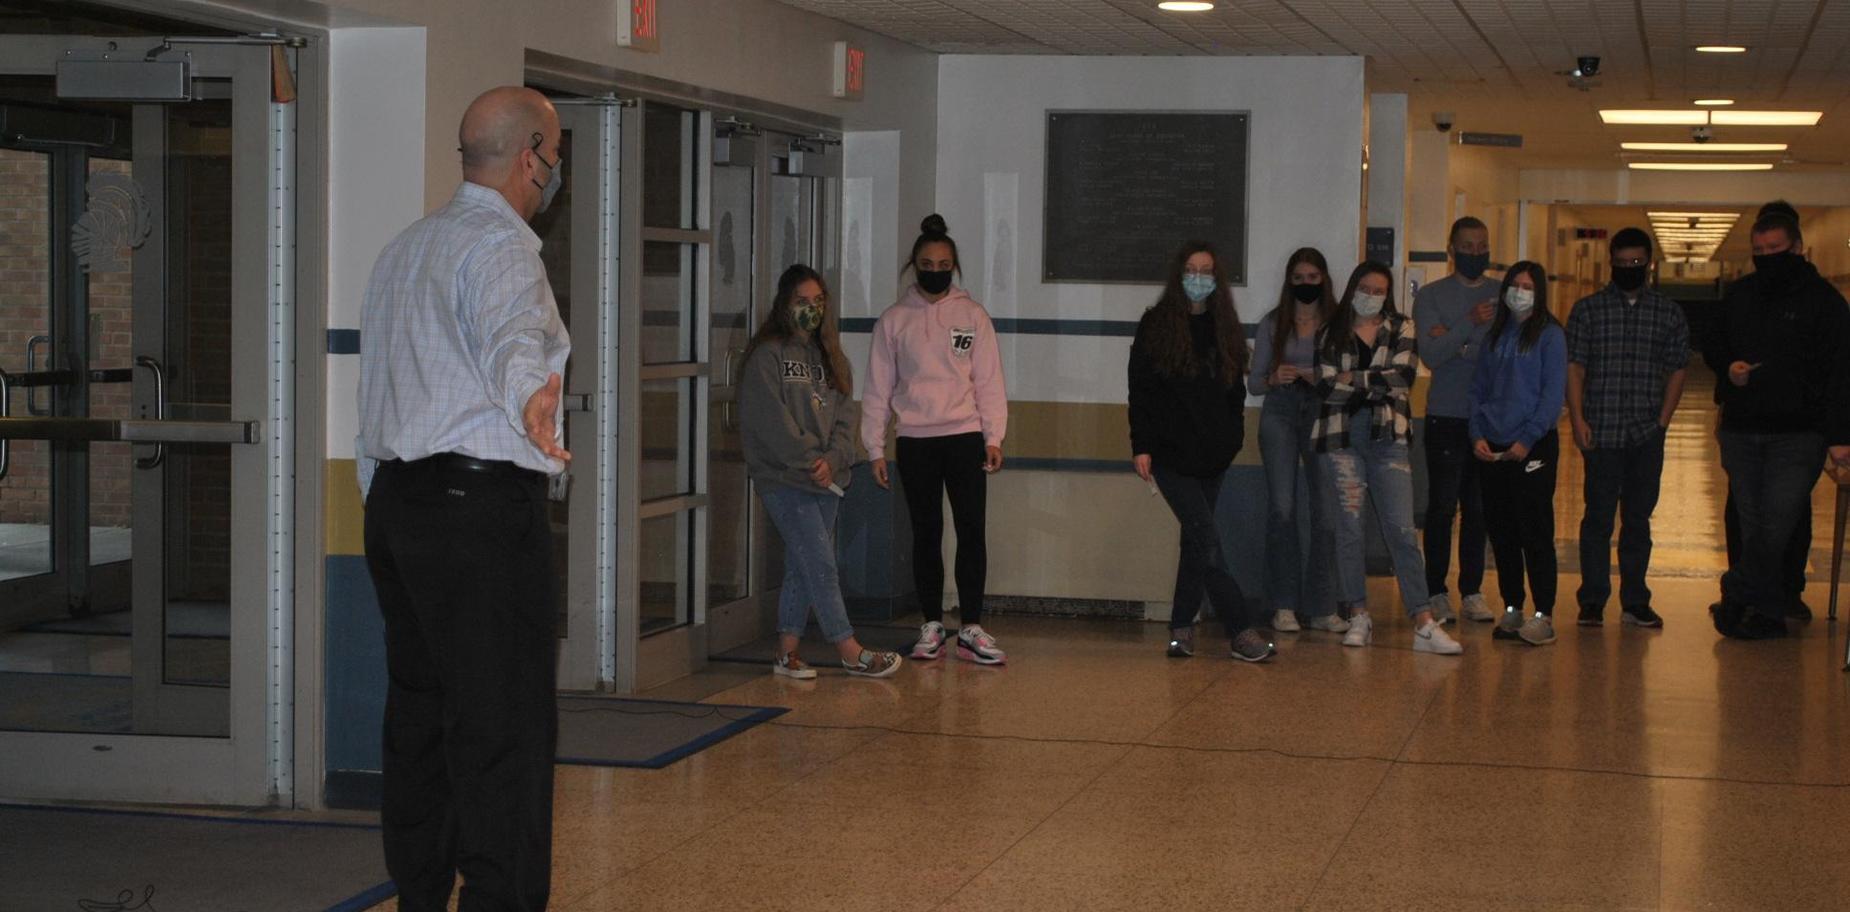 class activity in hallway